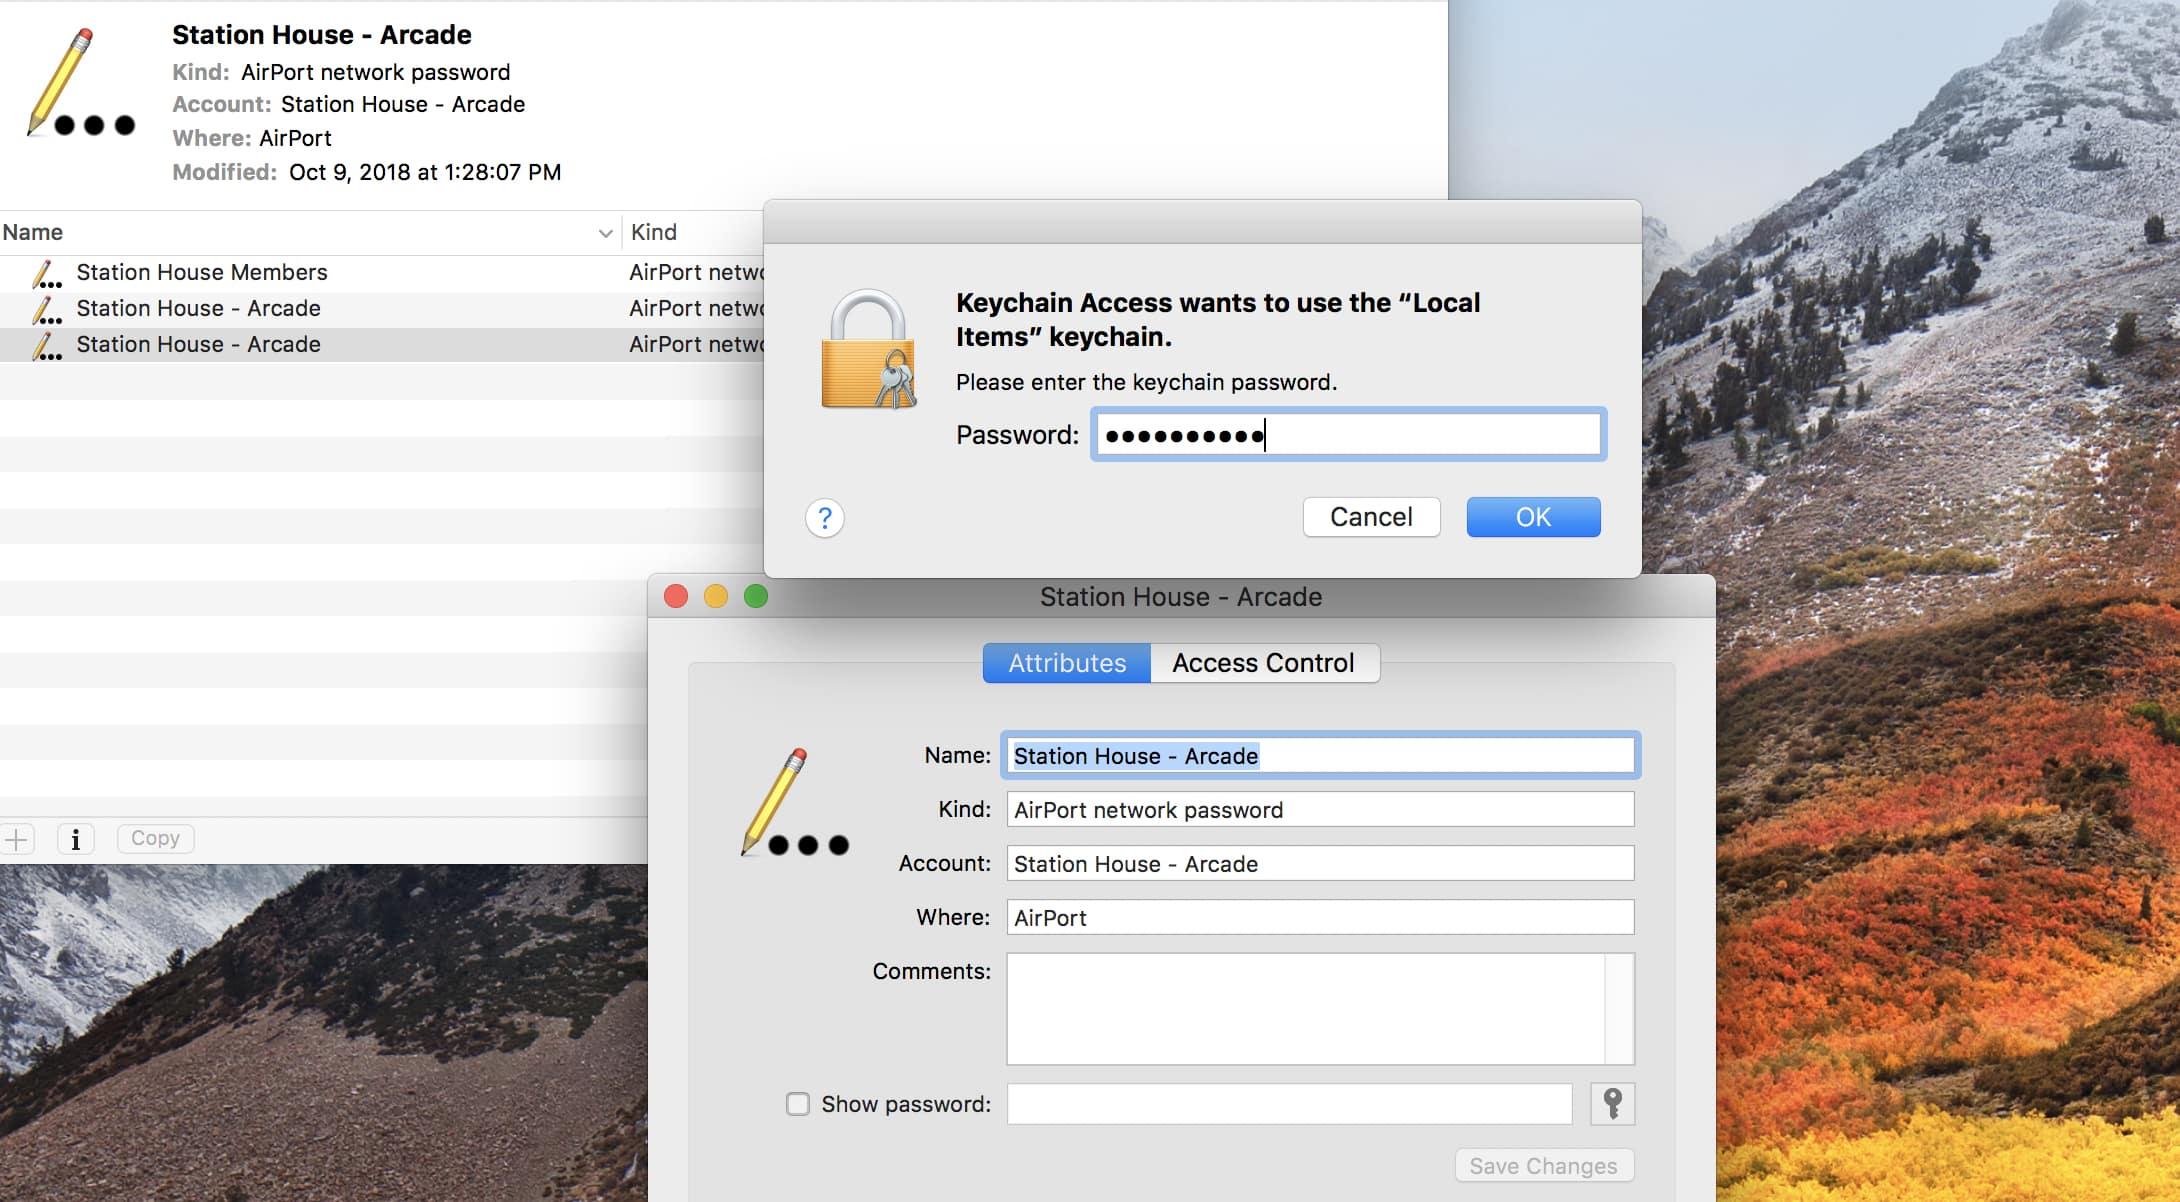 Enter Keychain Access Password